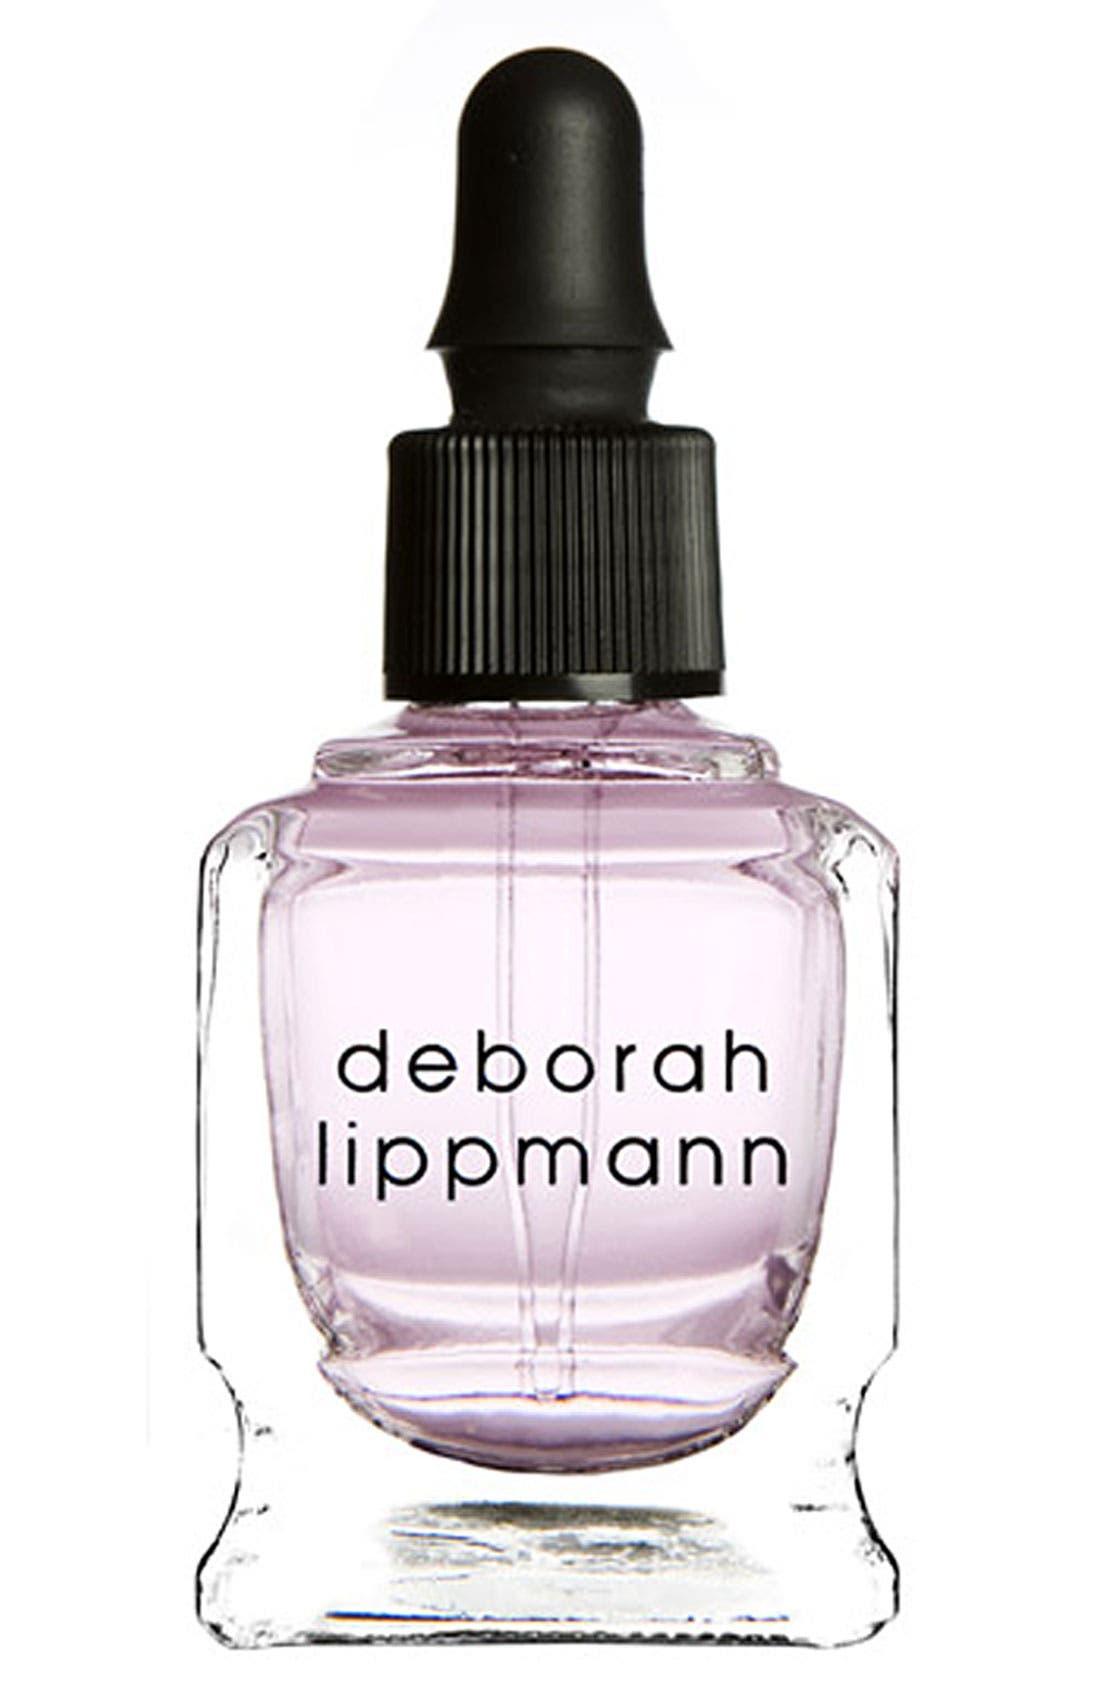 Deborah Lippmann Nail Primer